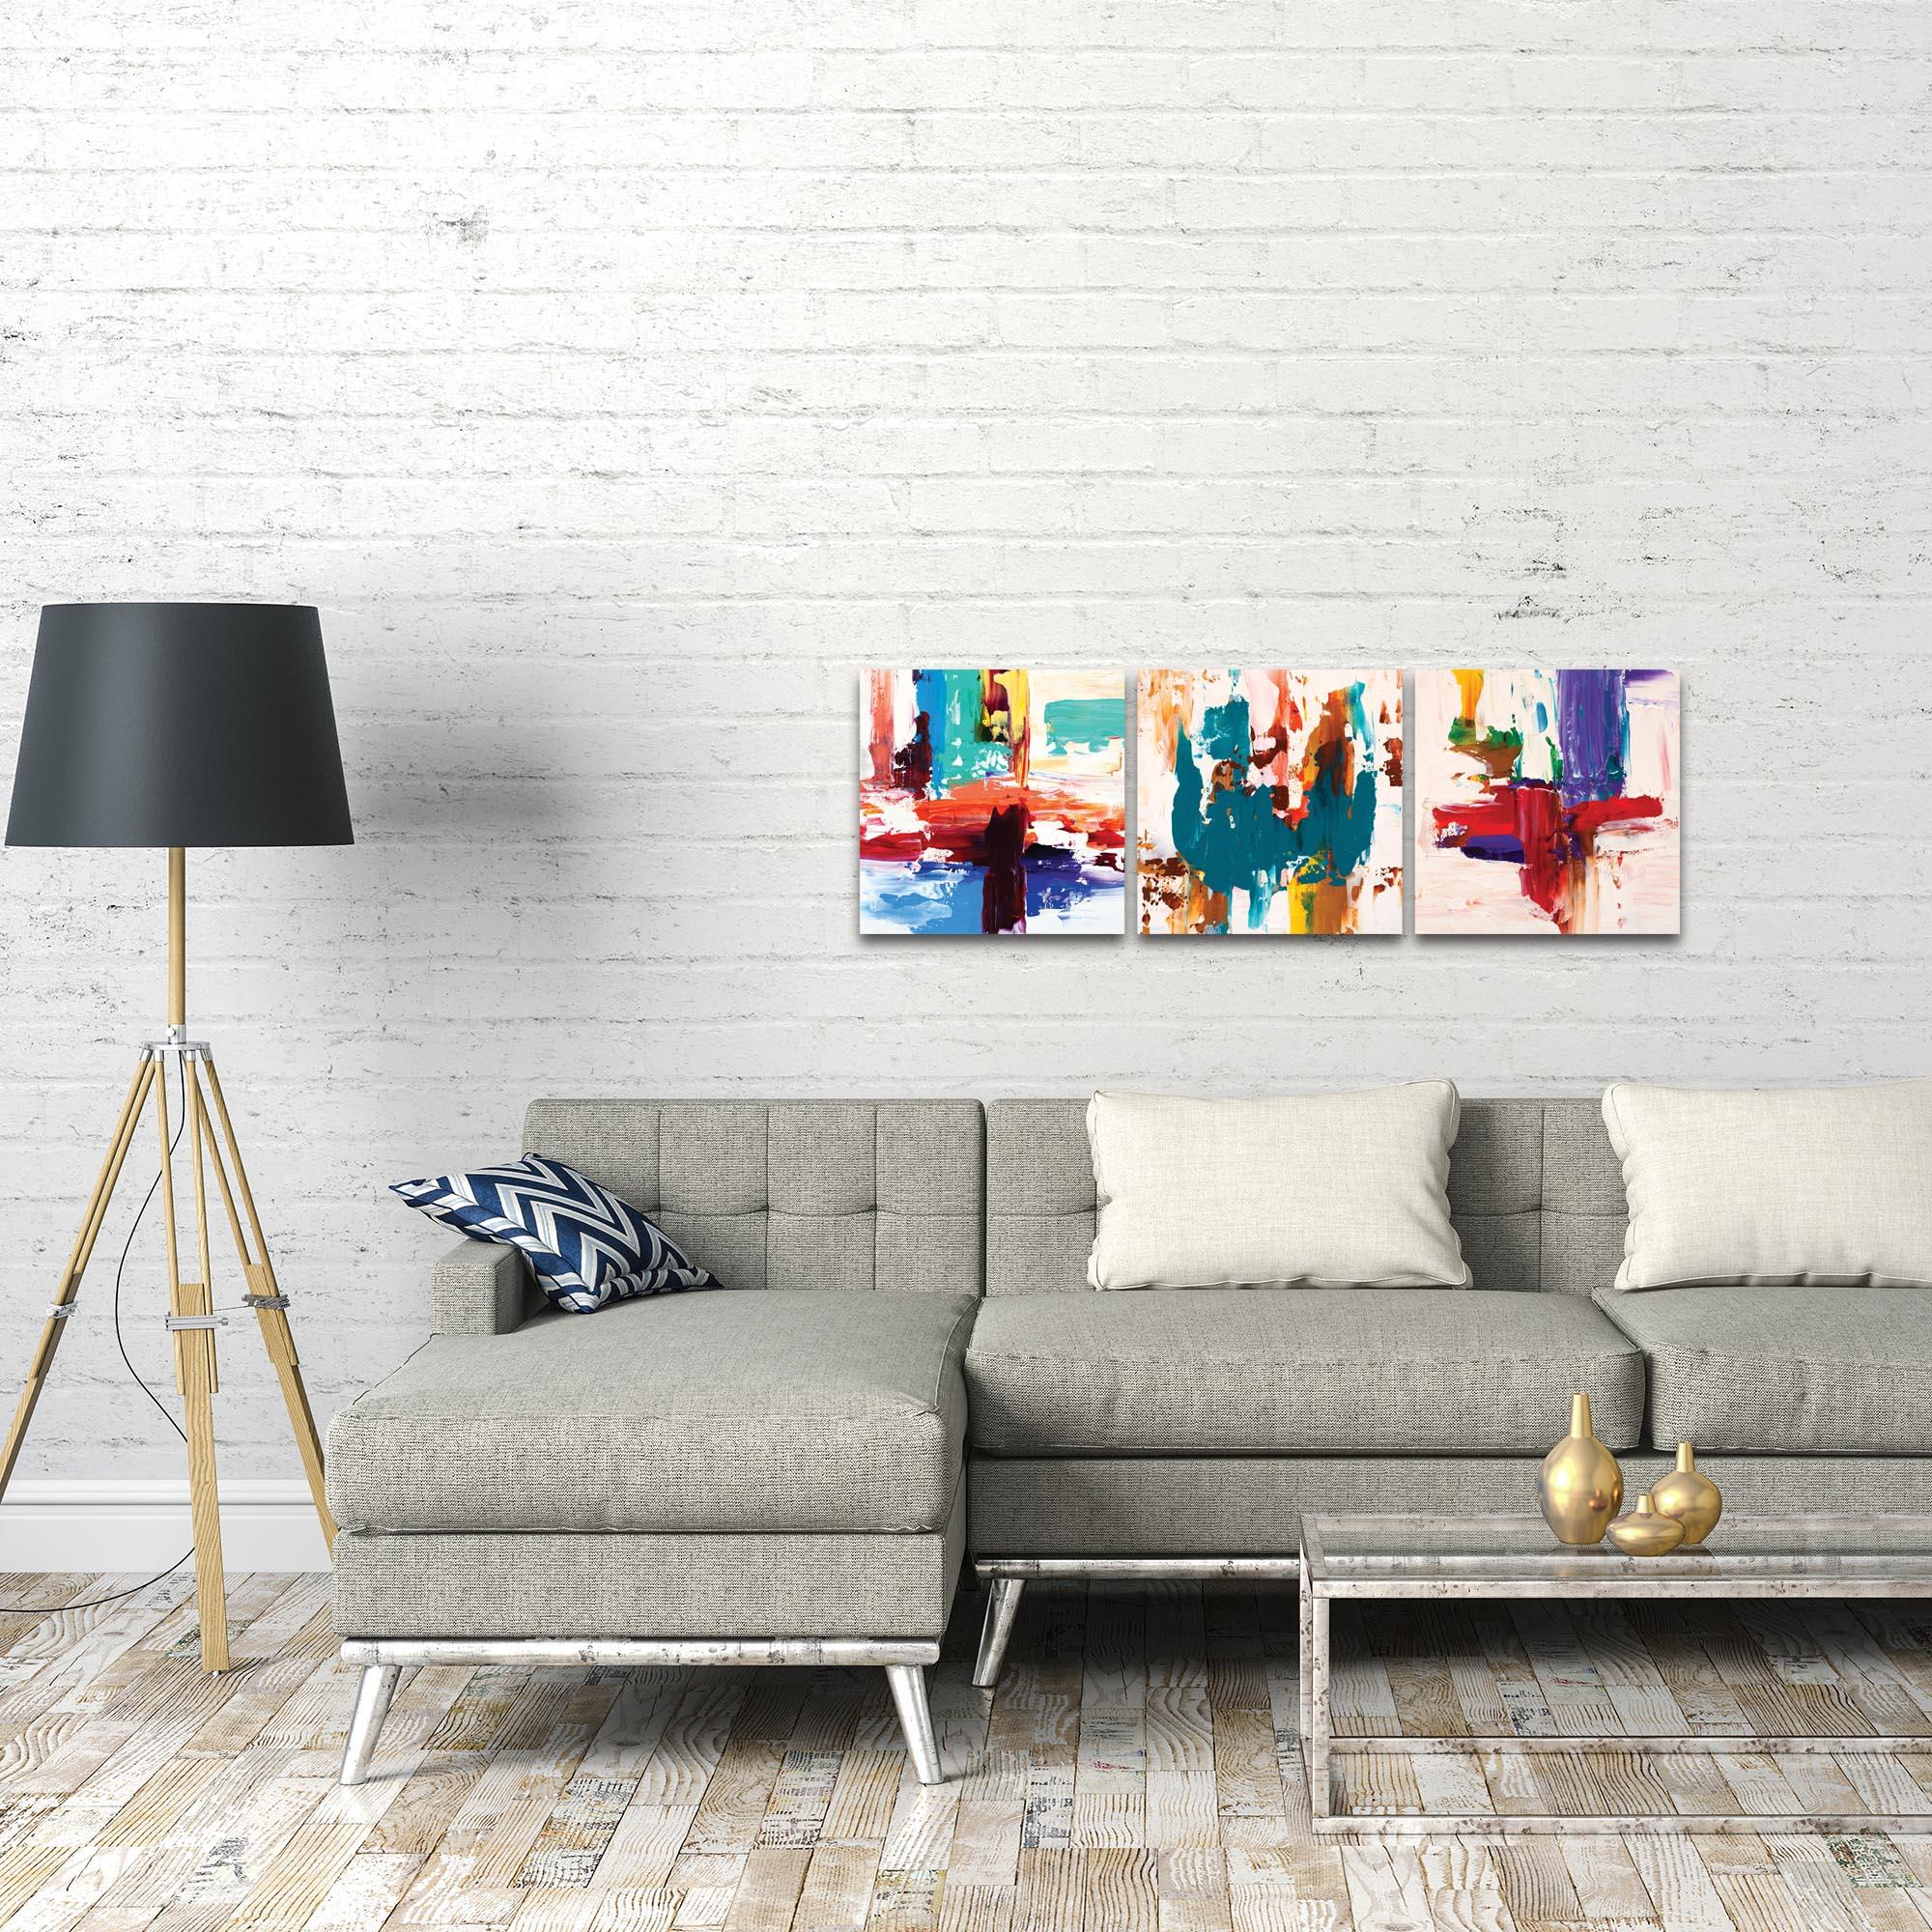 Abstract Wall Art 'Urban Triptych 2' - Urban Decor on Metal or Plexiglass - Lifestyle View